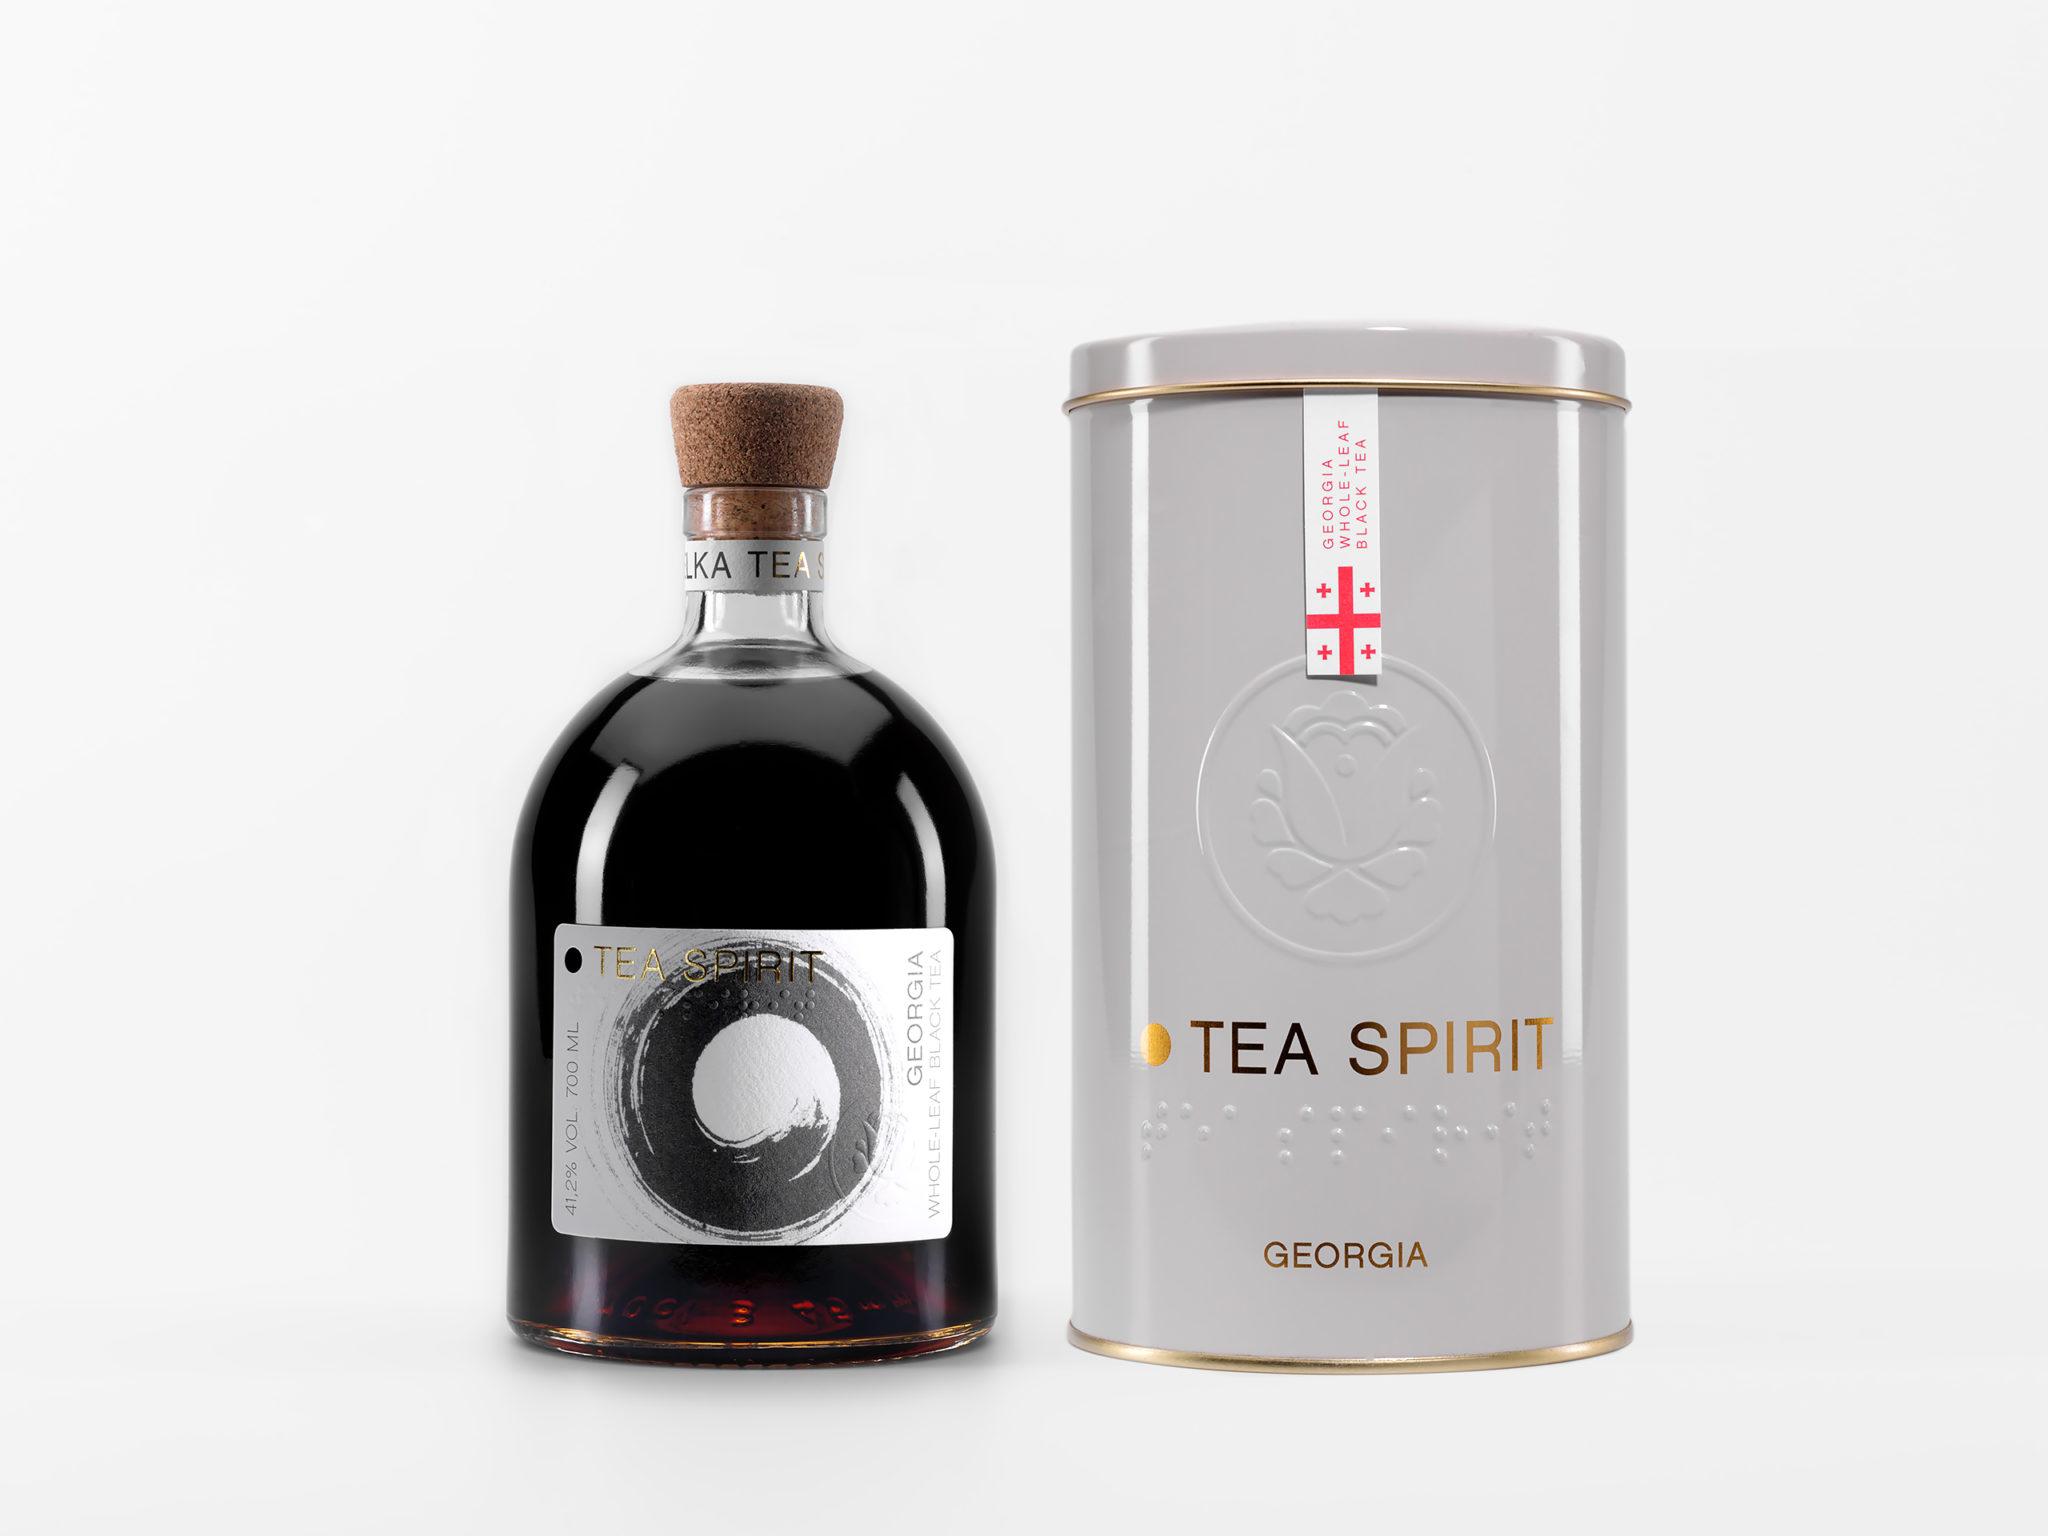 Tea Spirit